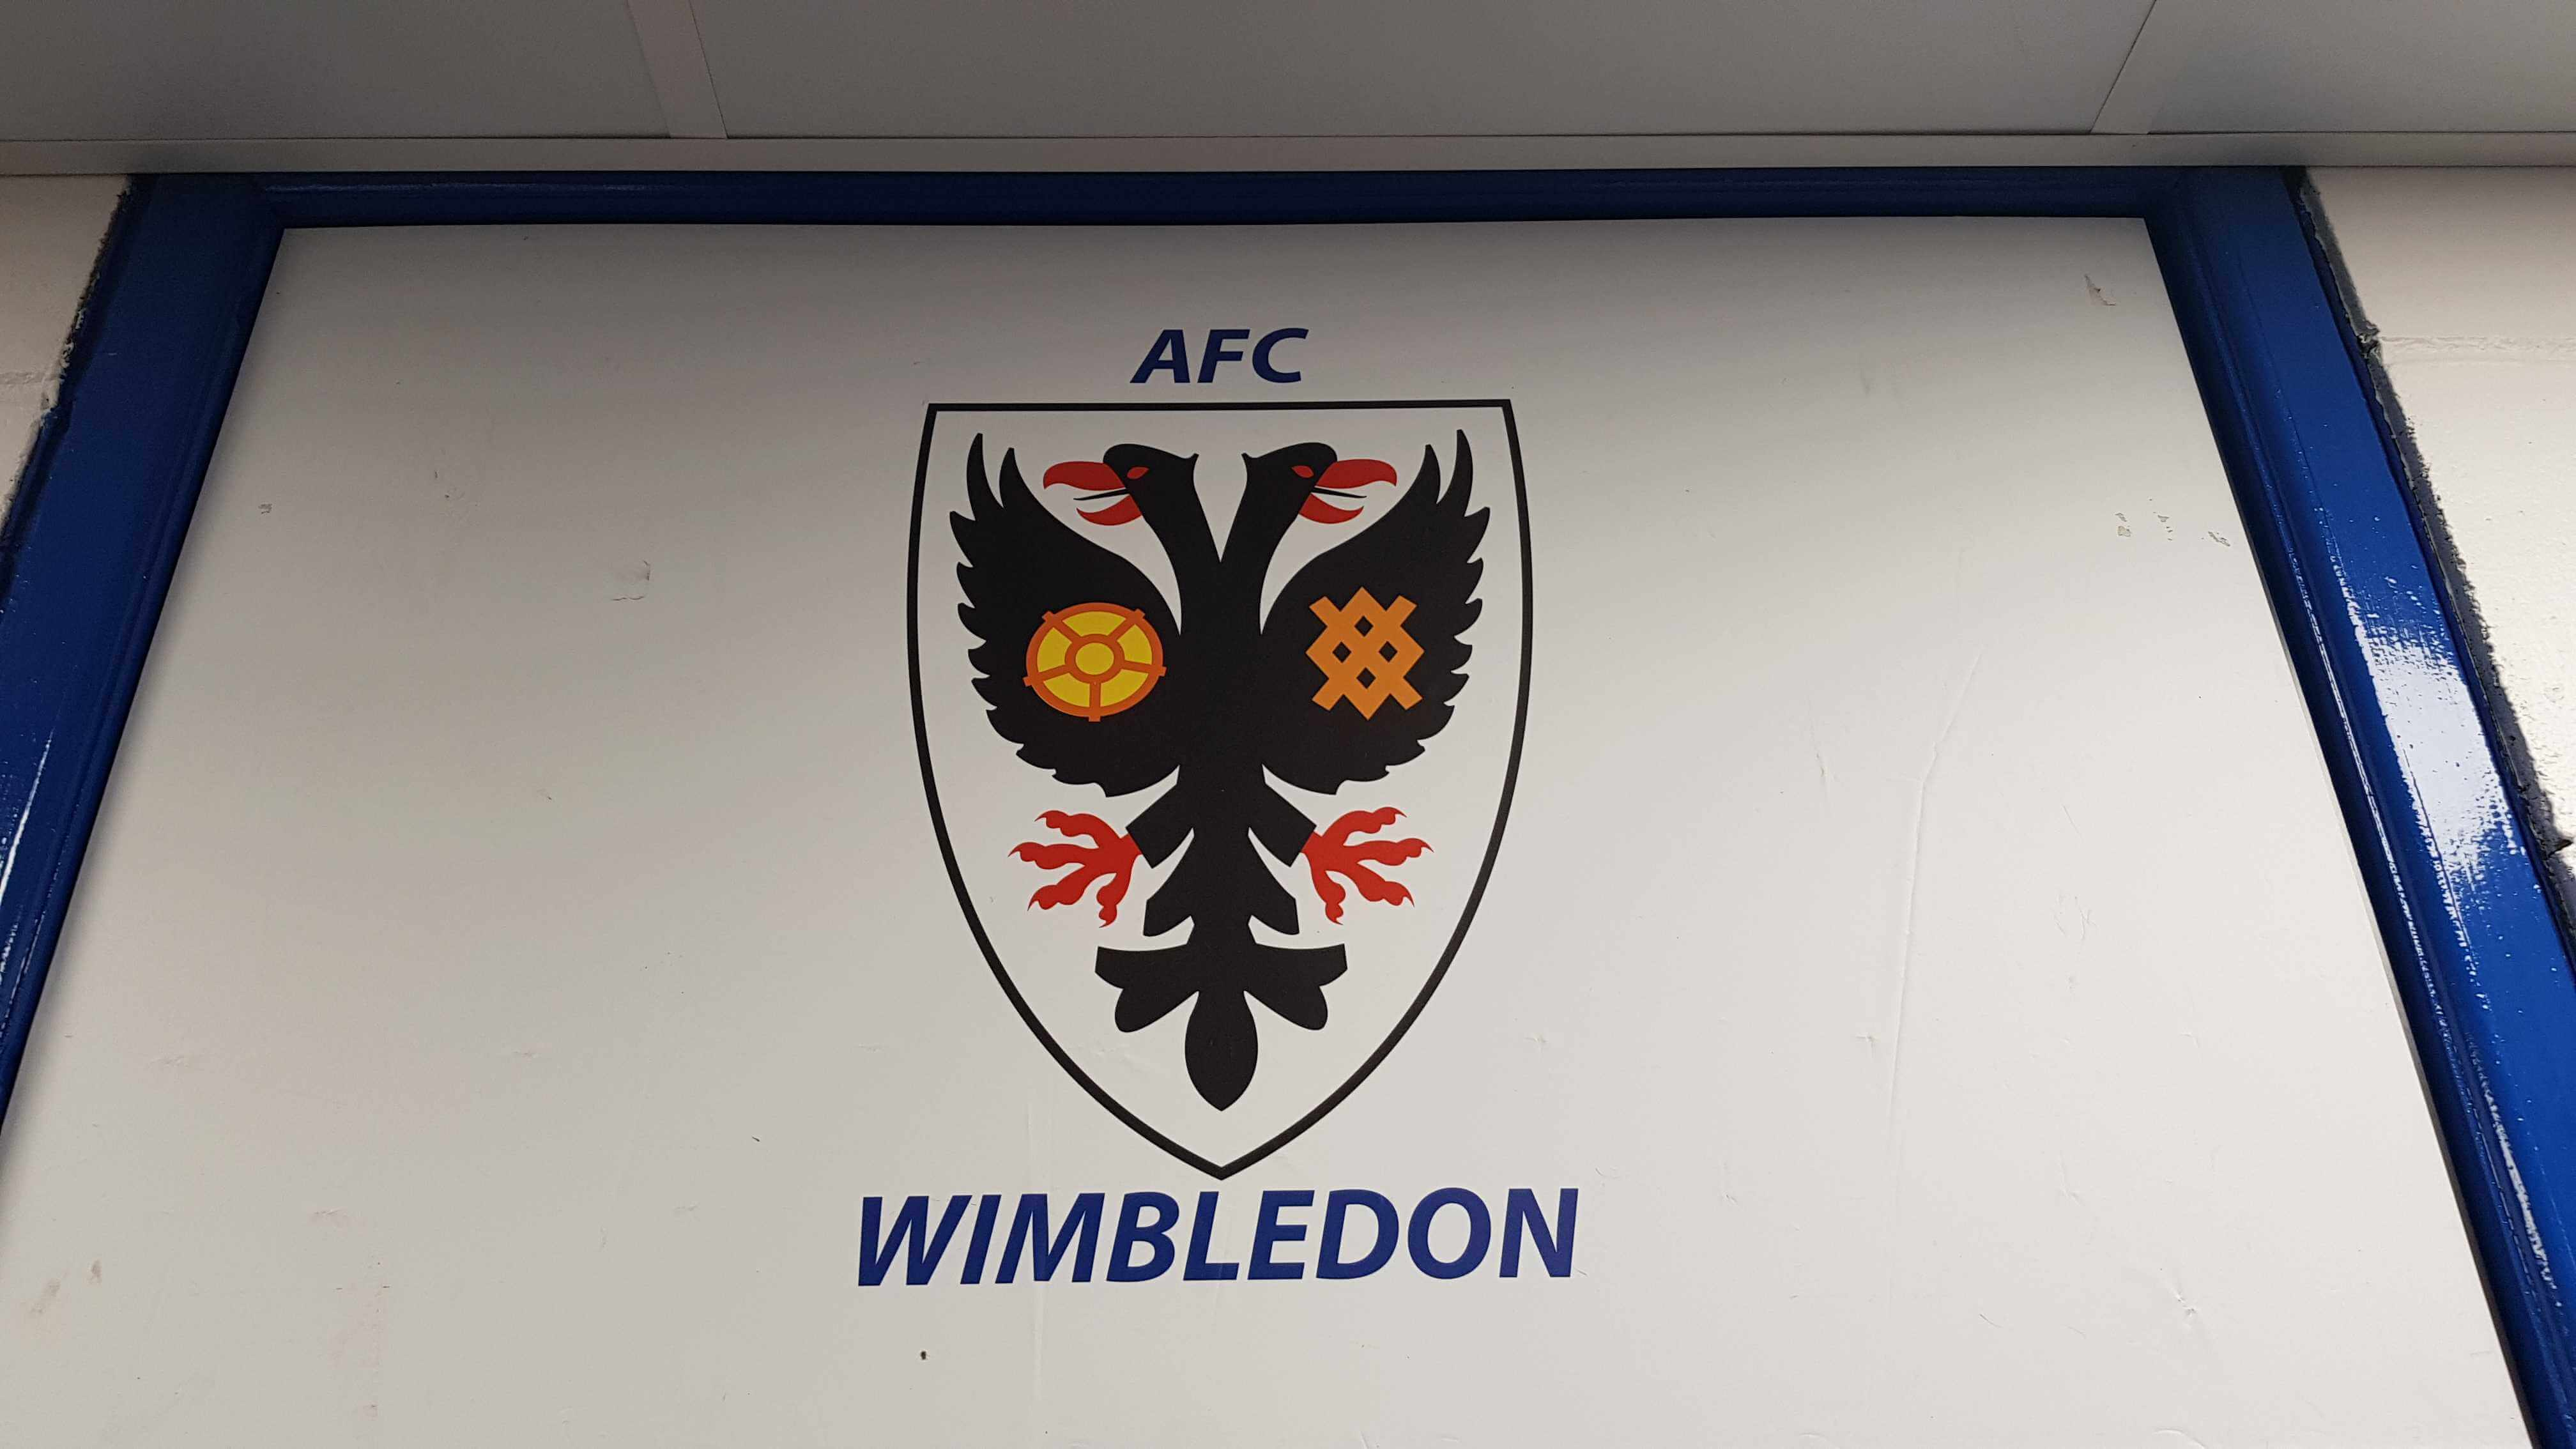 FansBet & AFC Wimbledon: A Partnership That Matters To The Fans